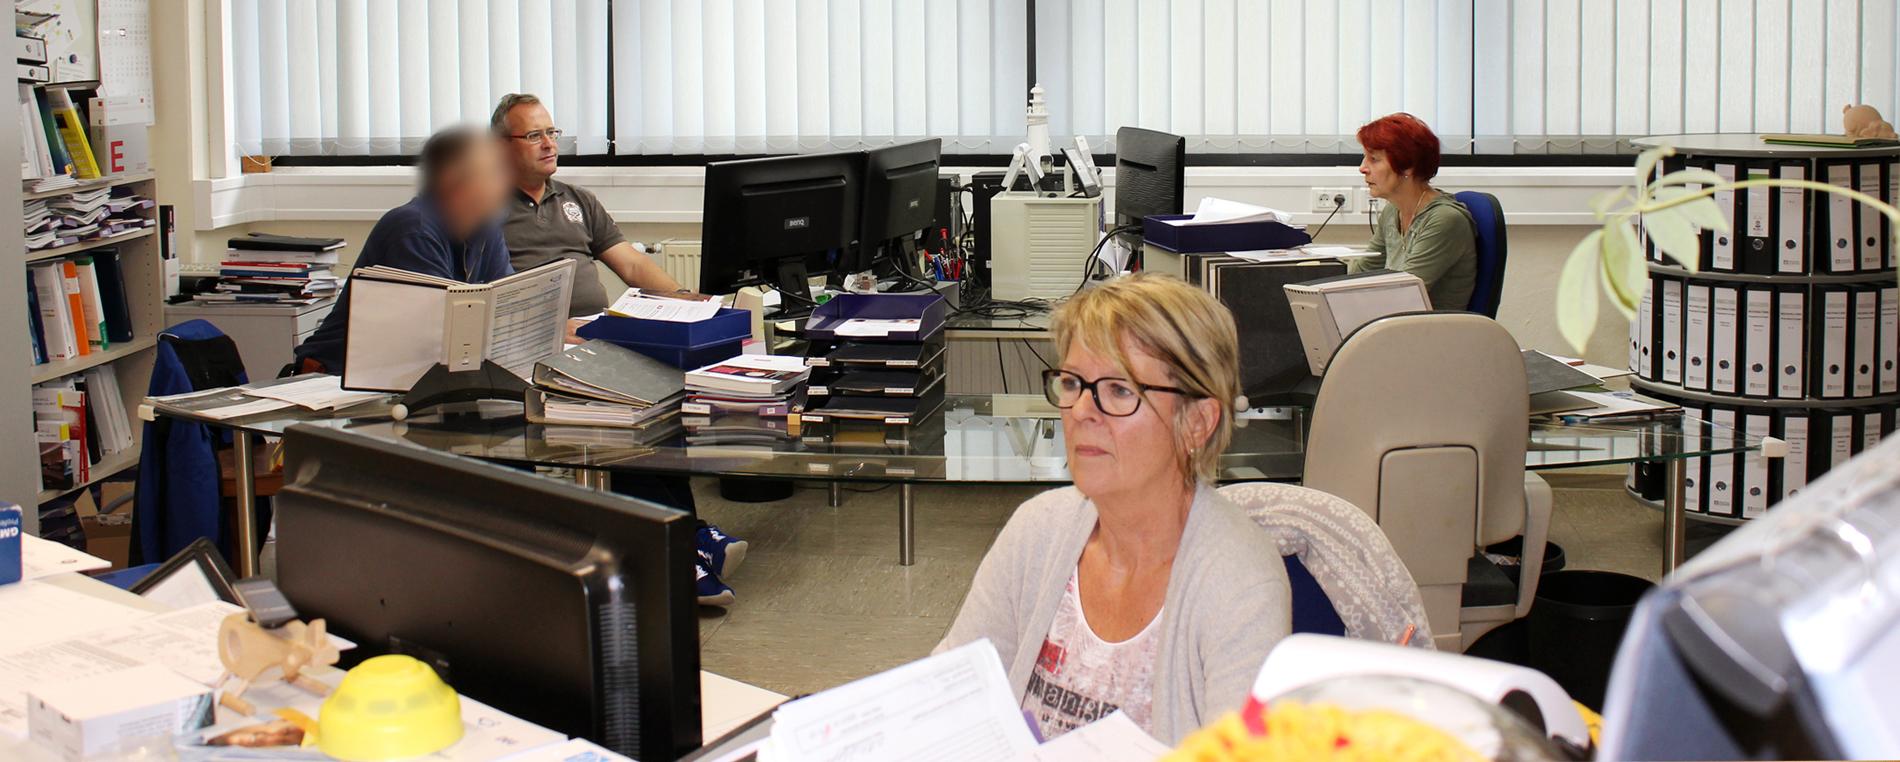 Ökolectric Ehmann Verwaltung Team Büro